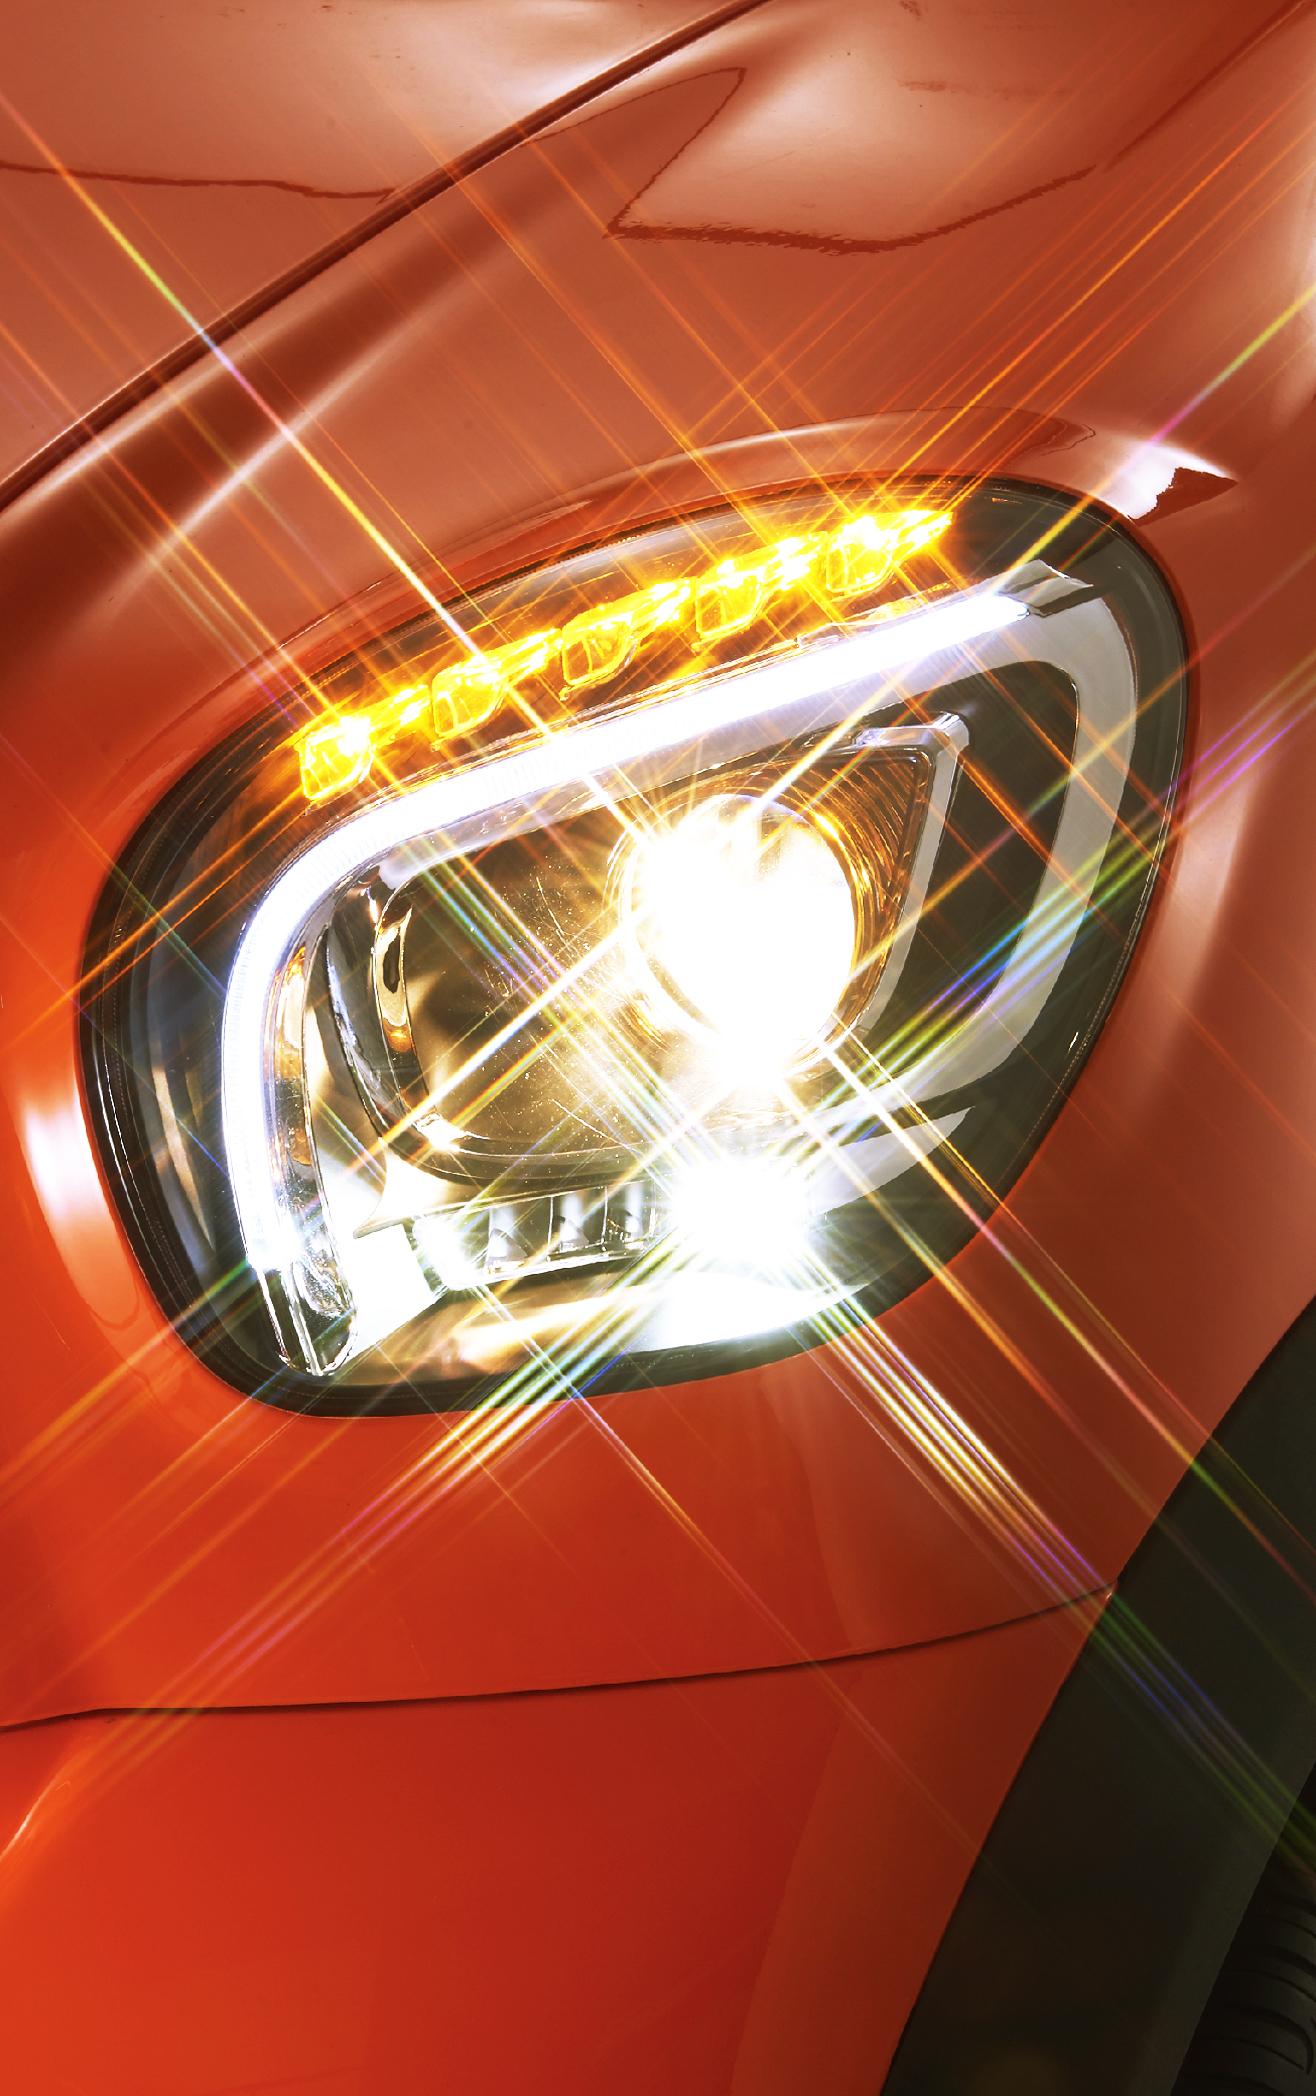 LED转向灯,位置灯<br>透镜式大灯组成的一体前照灯